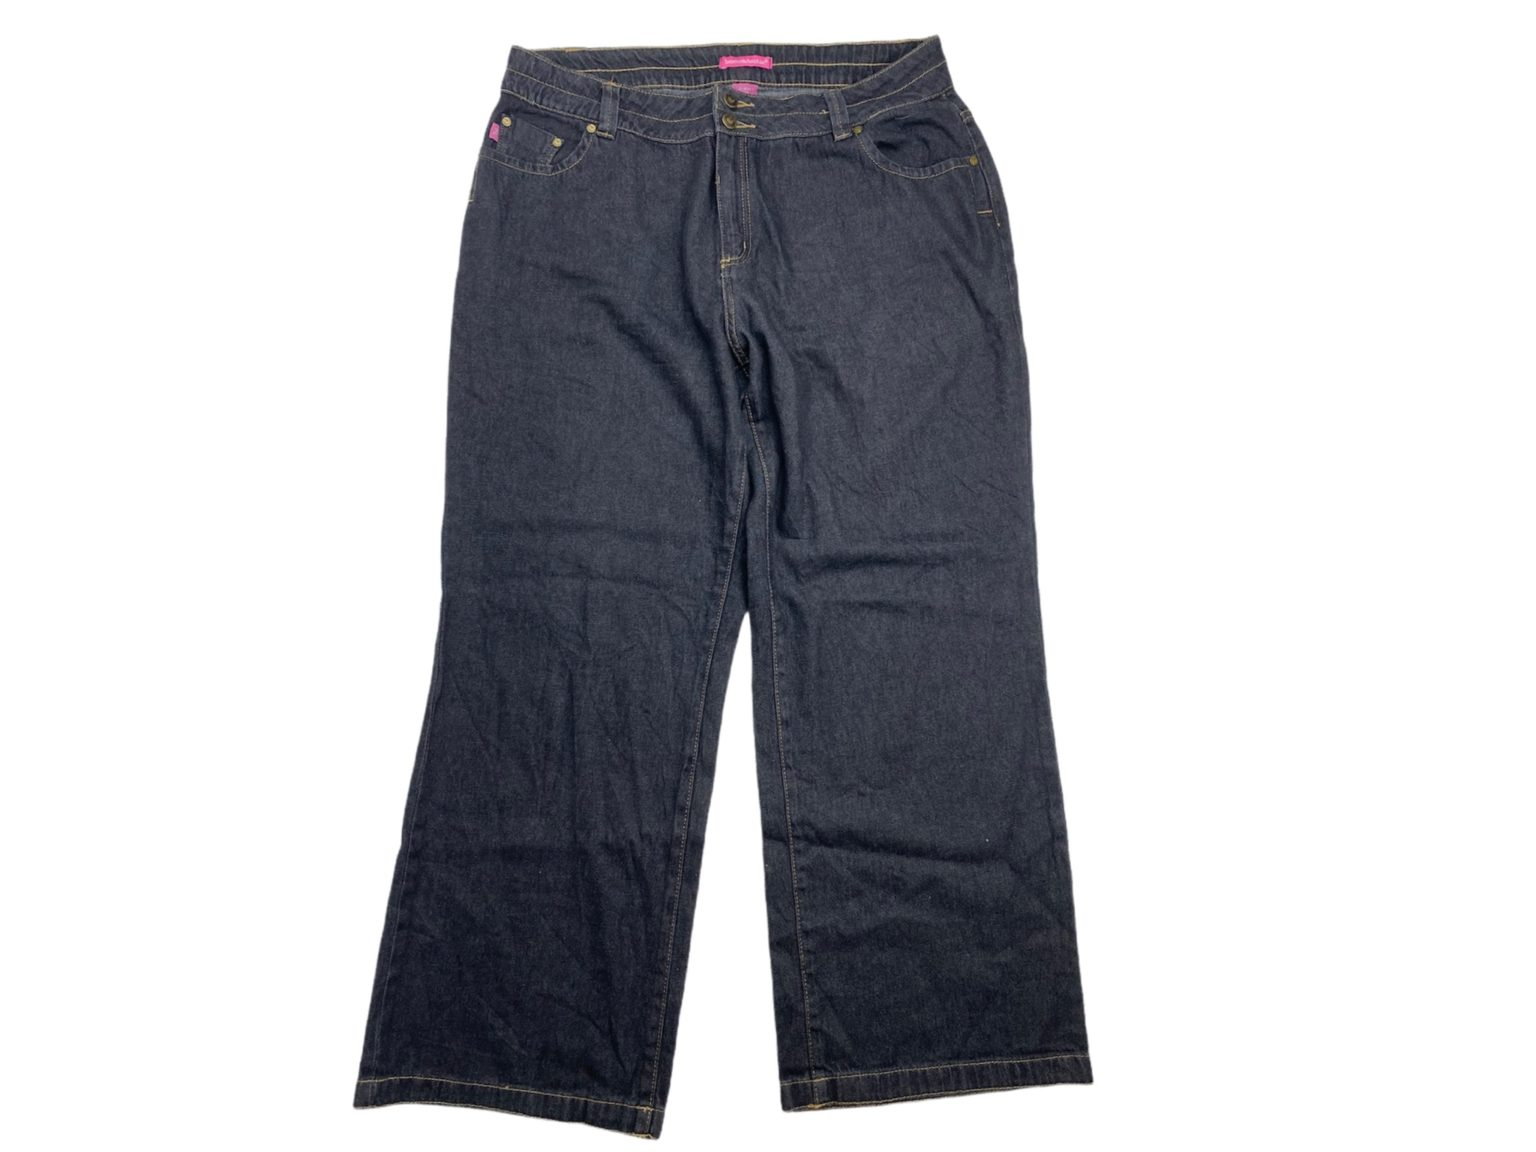 Pantalon Jean Mujer Largo Color Gris Hilo Khaki Dos ...